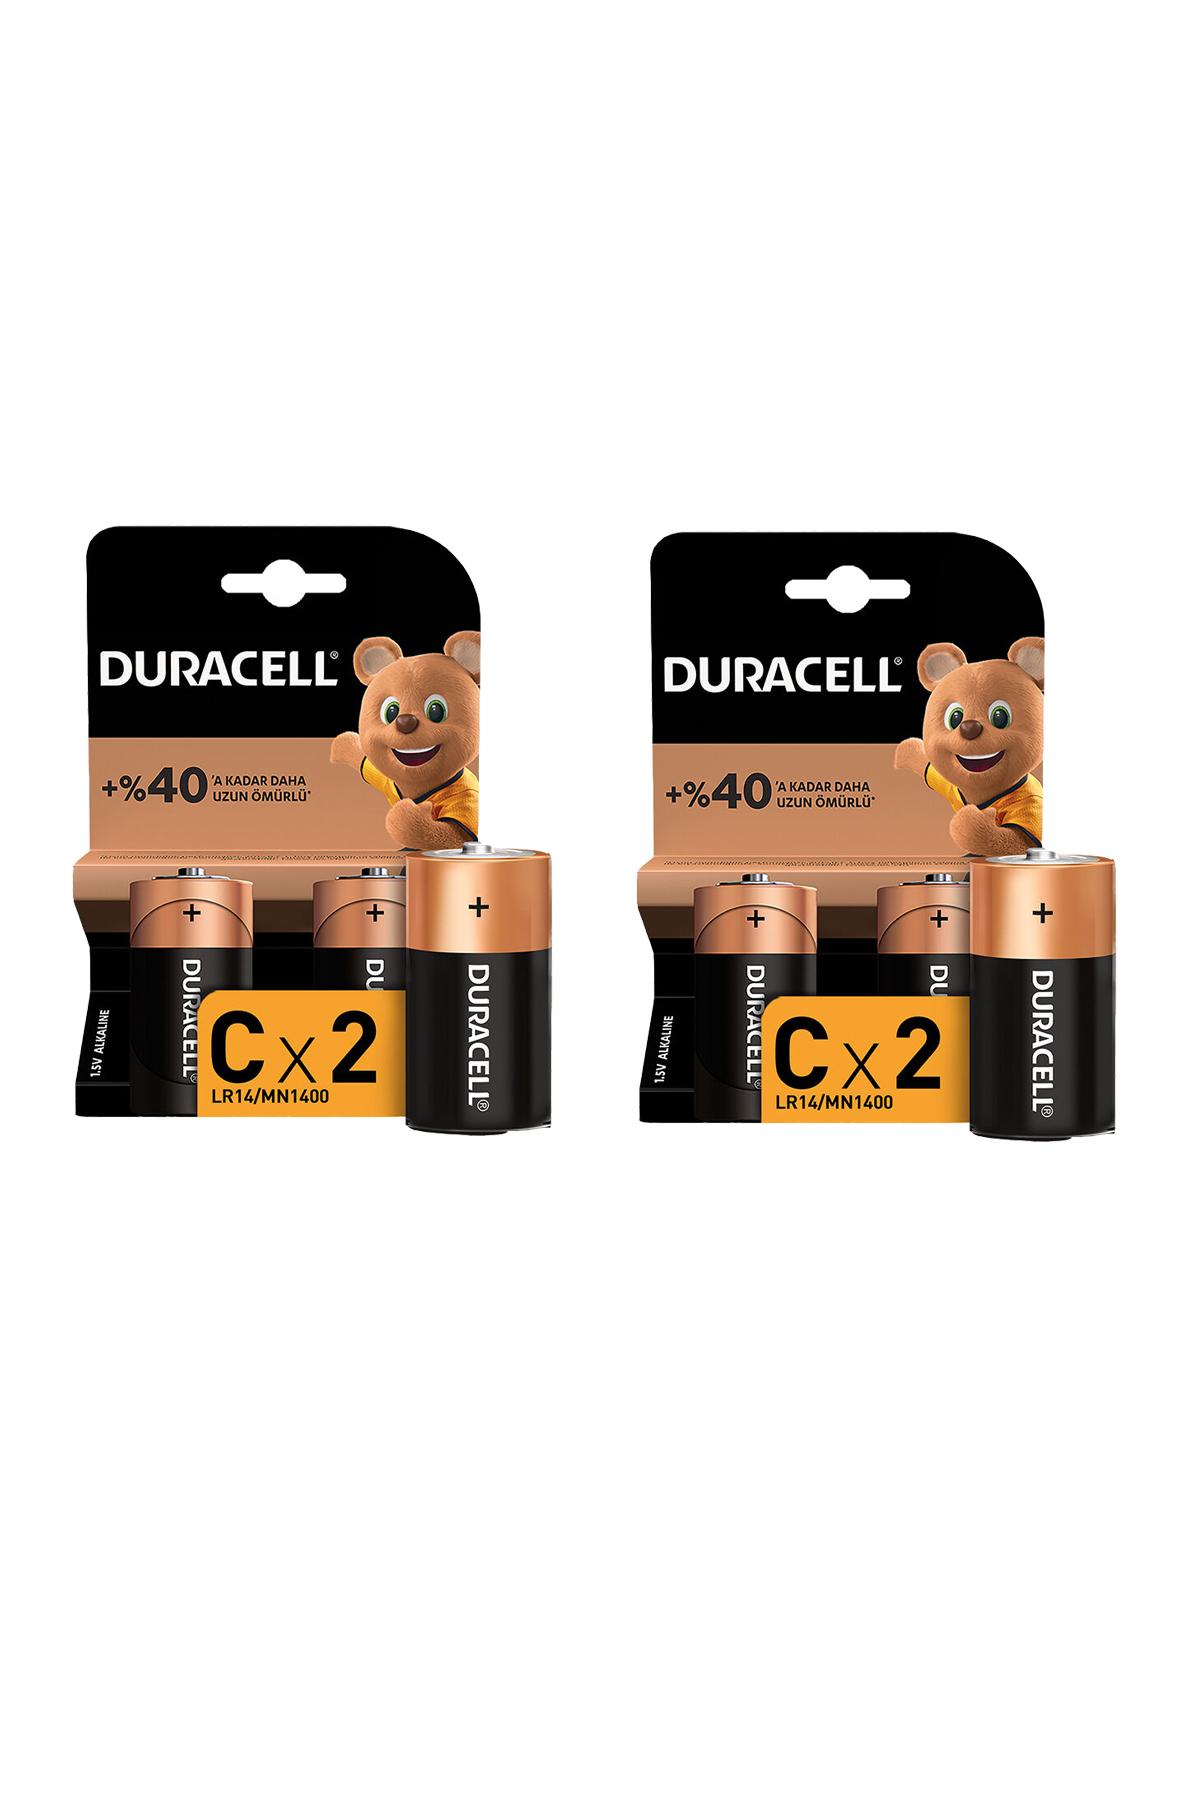 Duracell C 4 Adet Ortal Pil